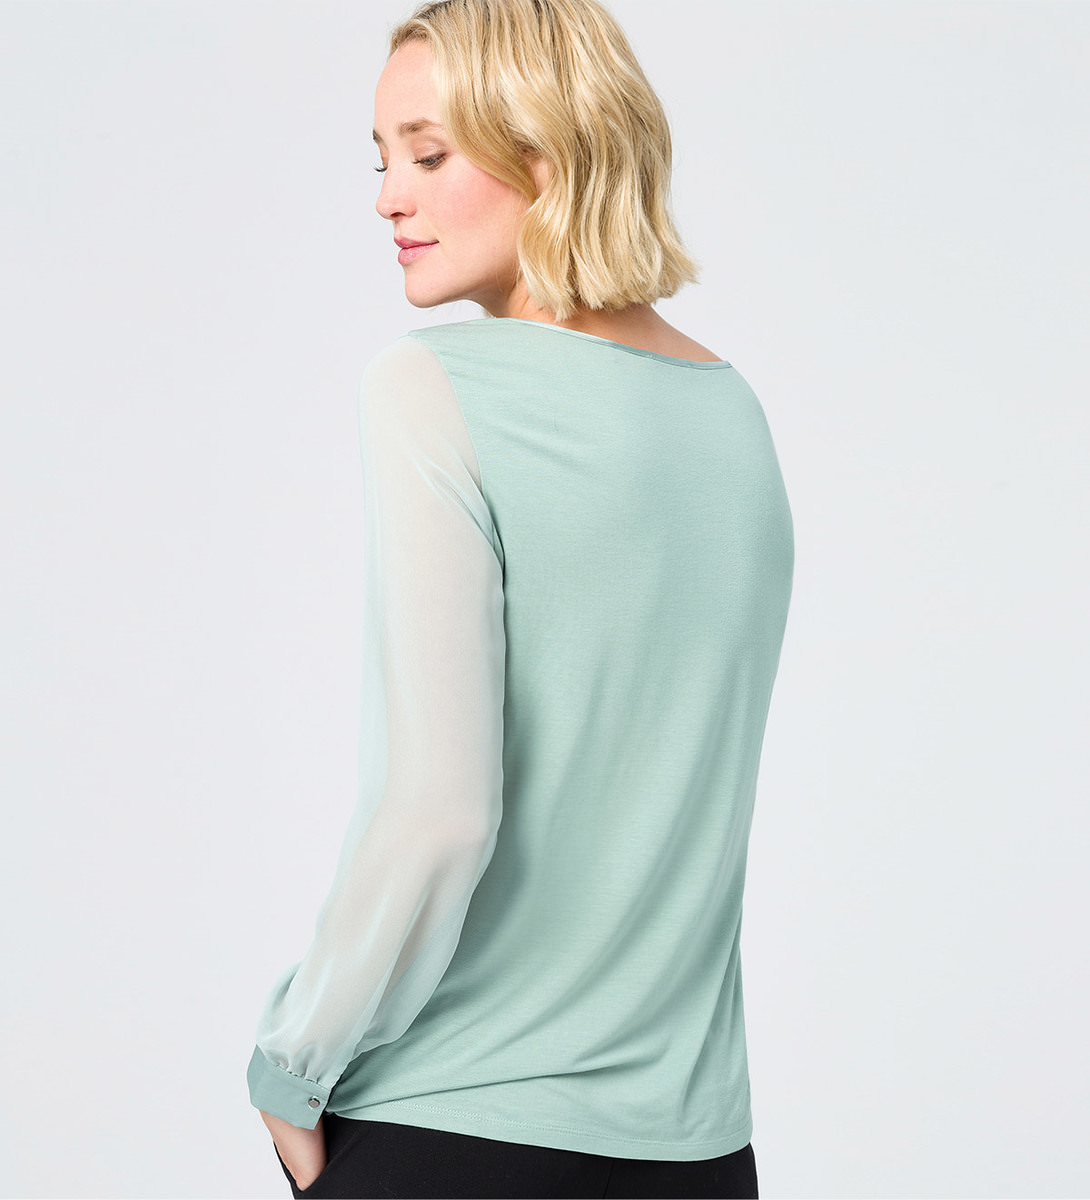 Blusenshirt im Chiffon-Look in light jade